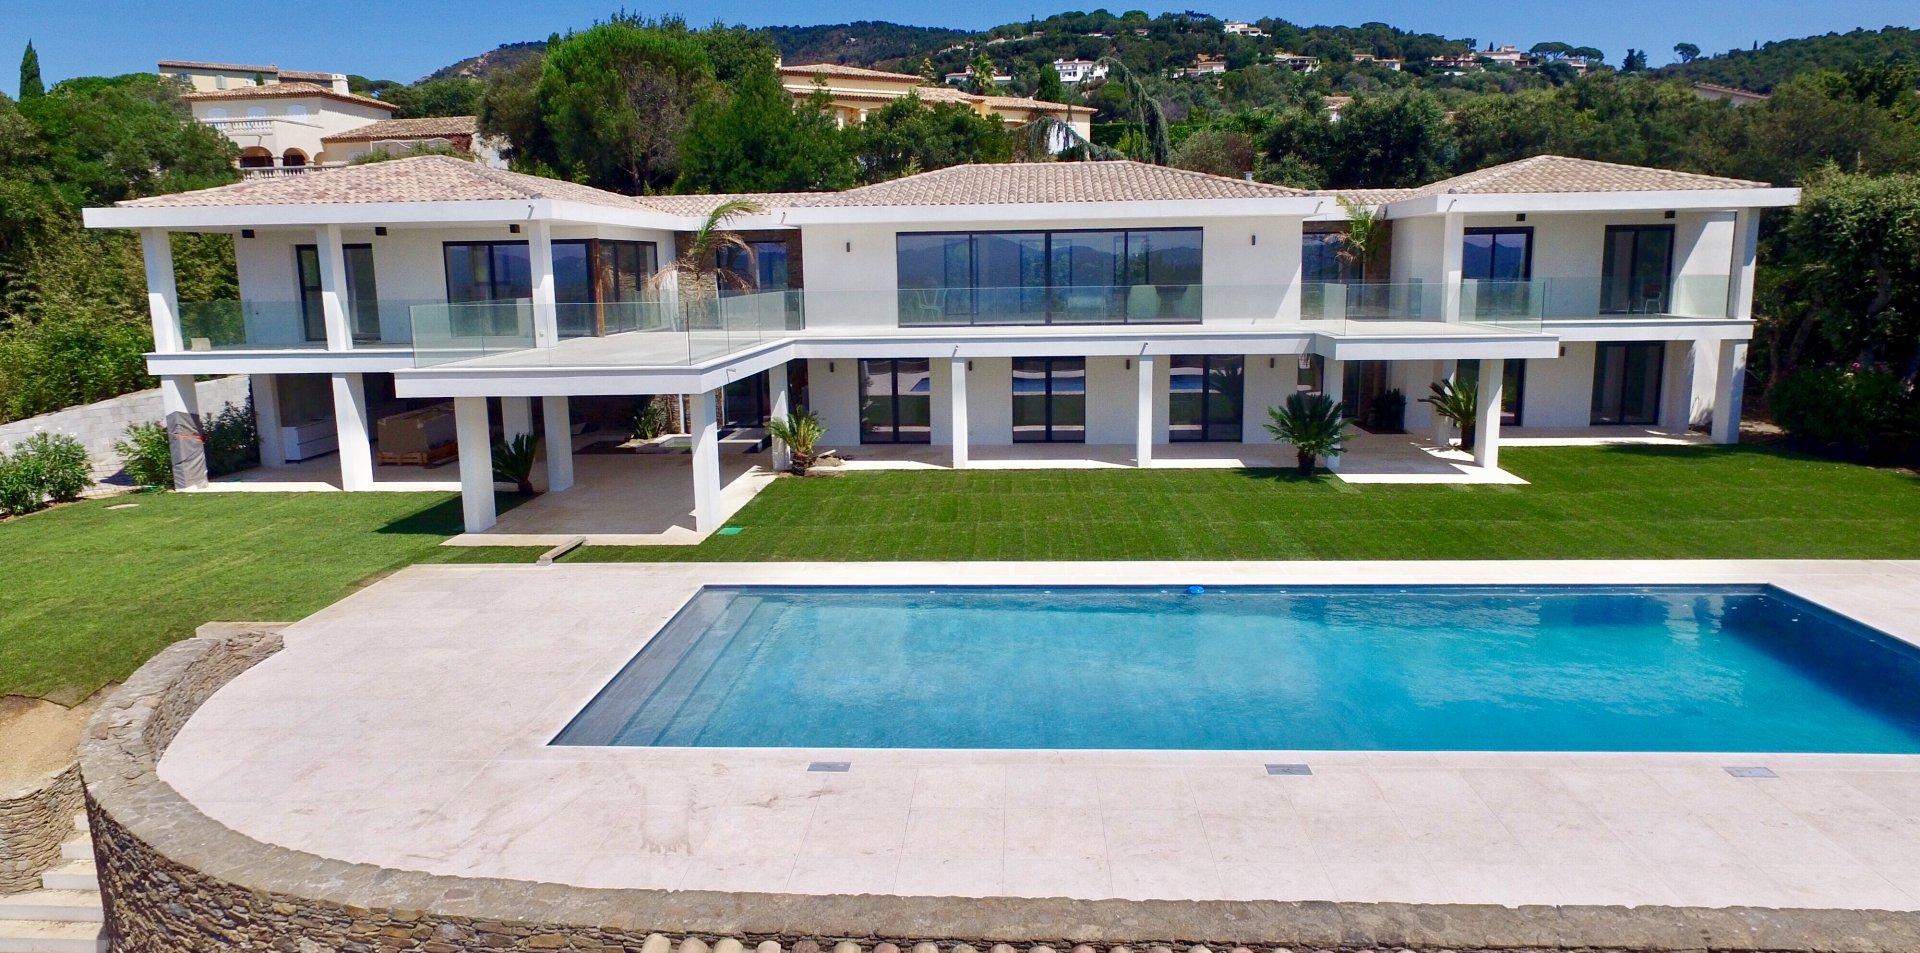 出售 别墅 - Grimaud